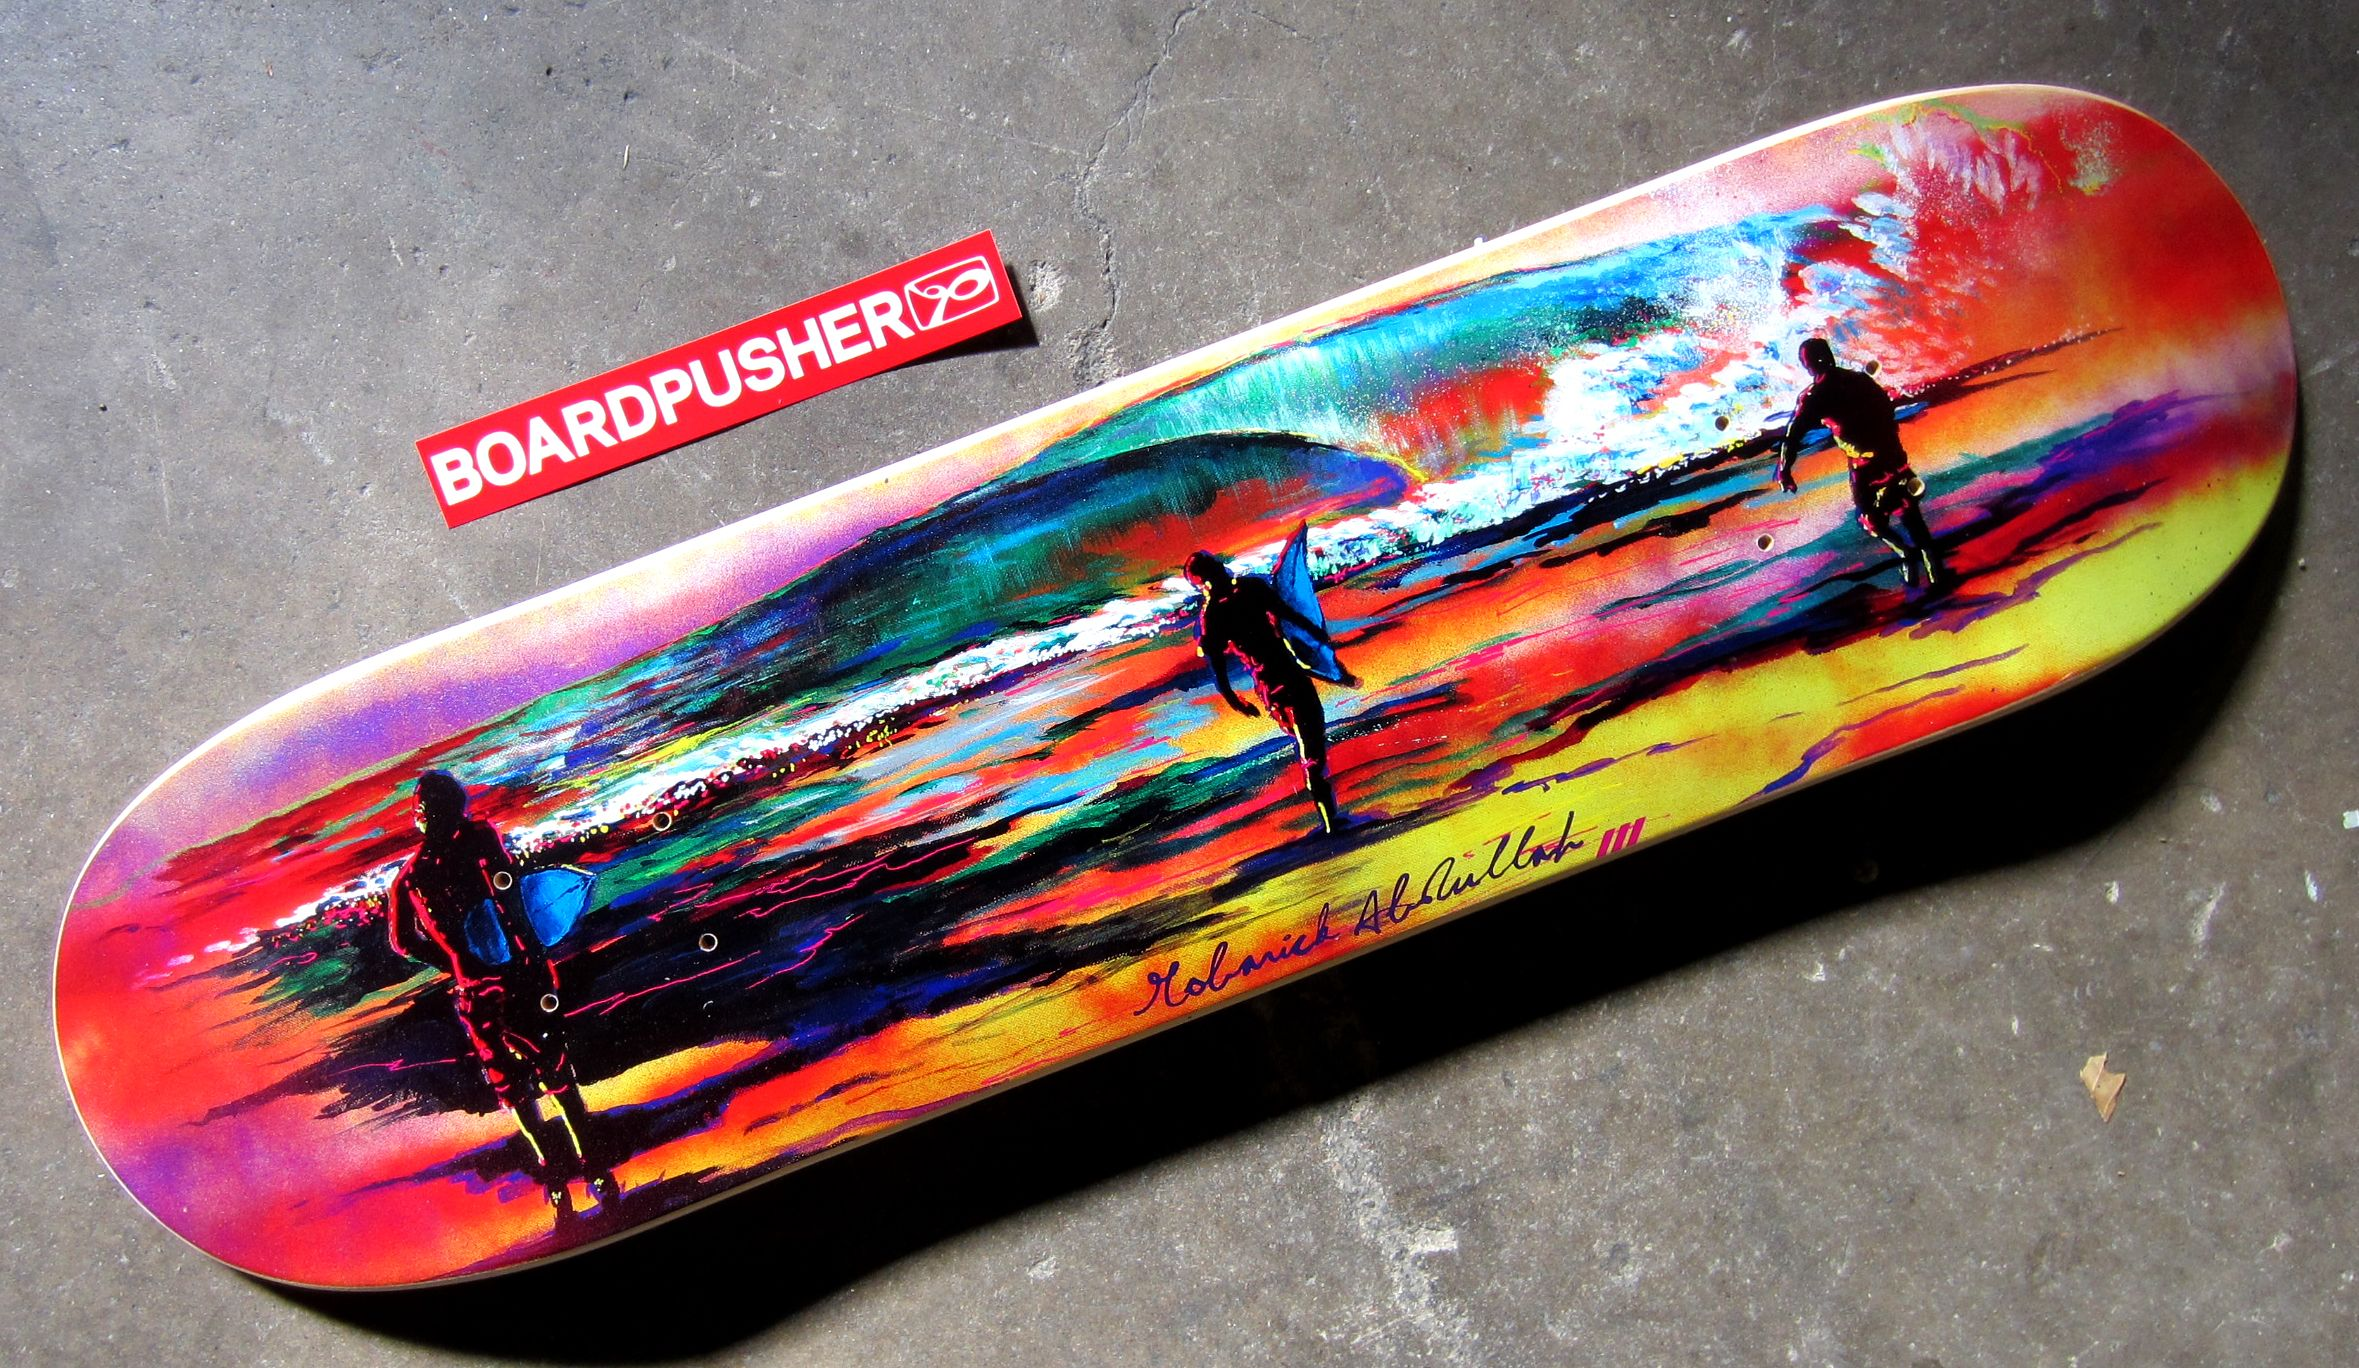 Boardpusher Custom Skateboards Skateboard Deck Art Painted Skateboard Skateboard Design